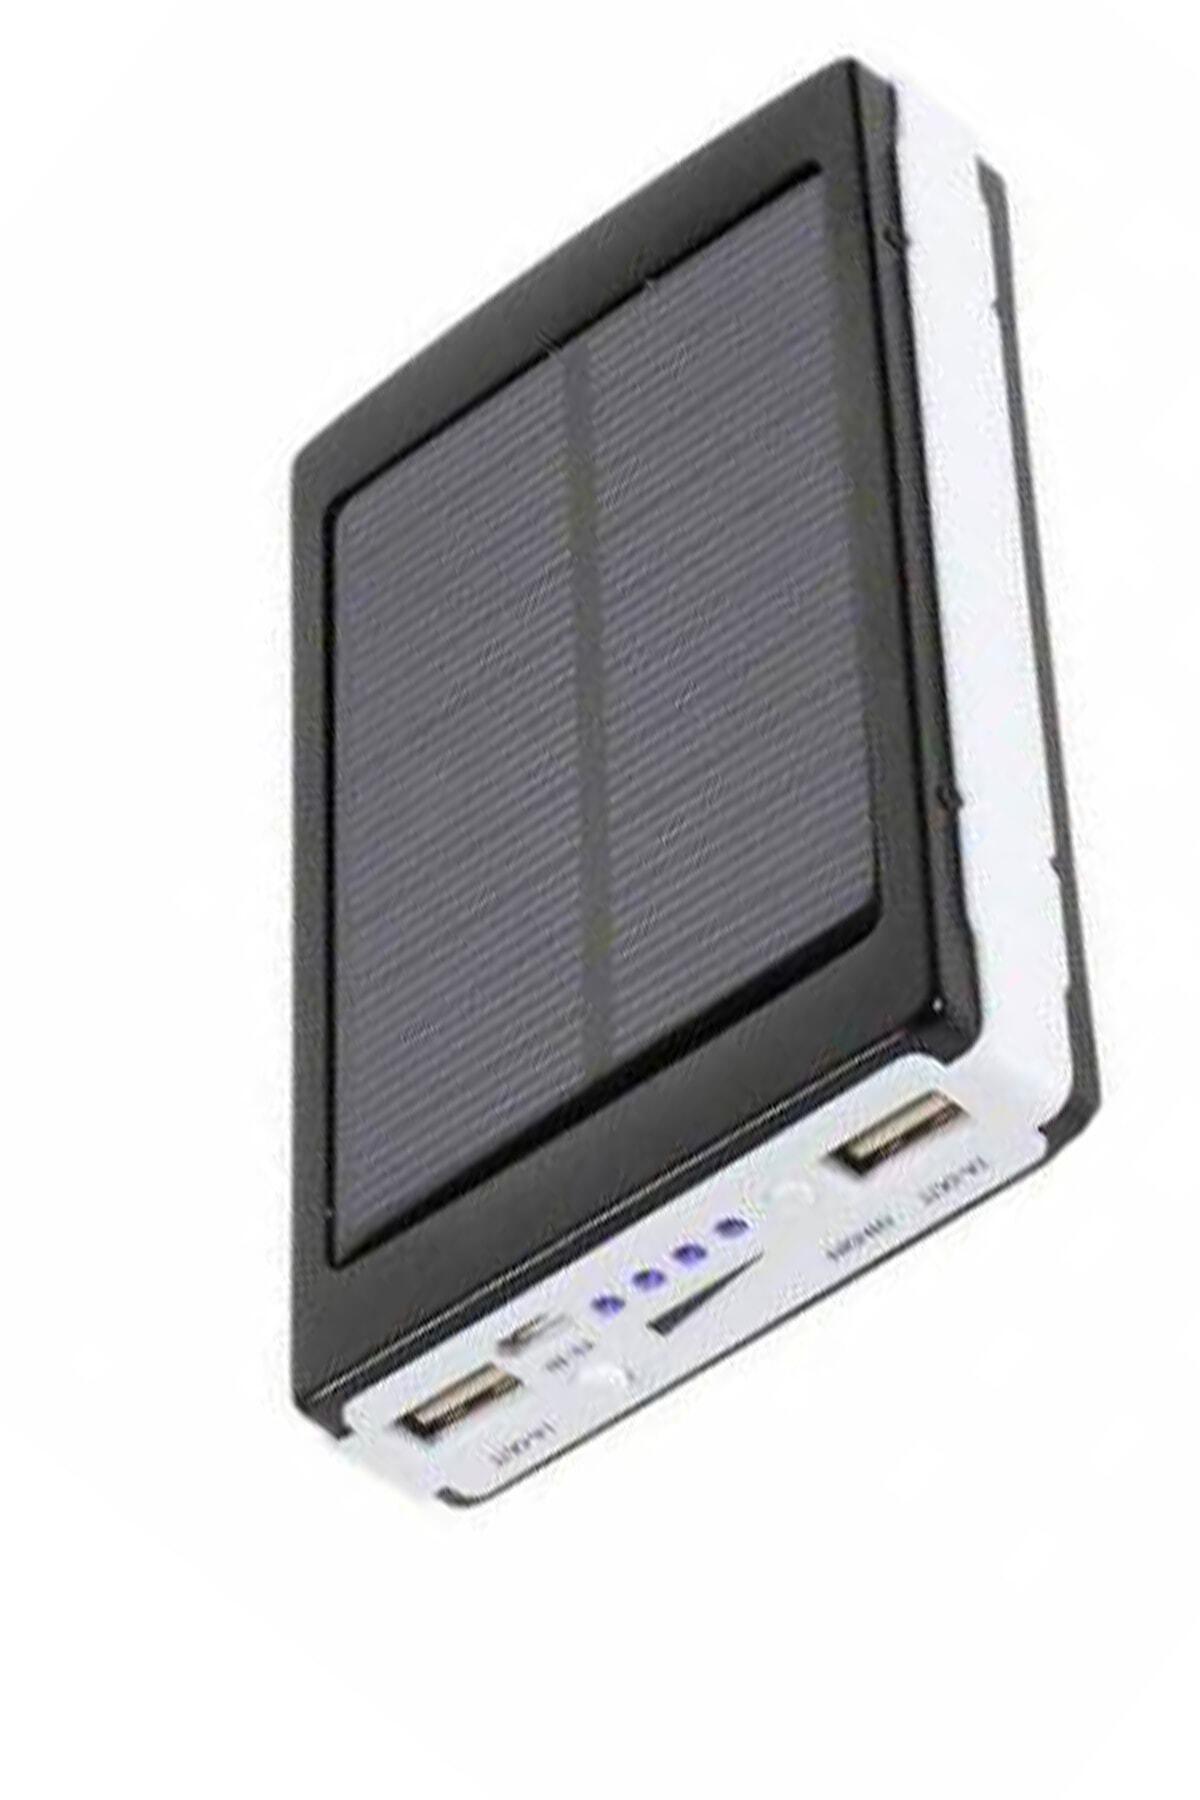 Solar Powerbank 18000 Mah Güneş Enerjili Powerbank 20 Led Işıklı - 2 Usb Girişli Kamp Çadır Işığı